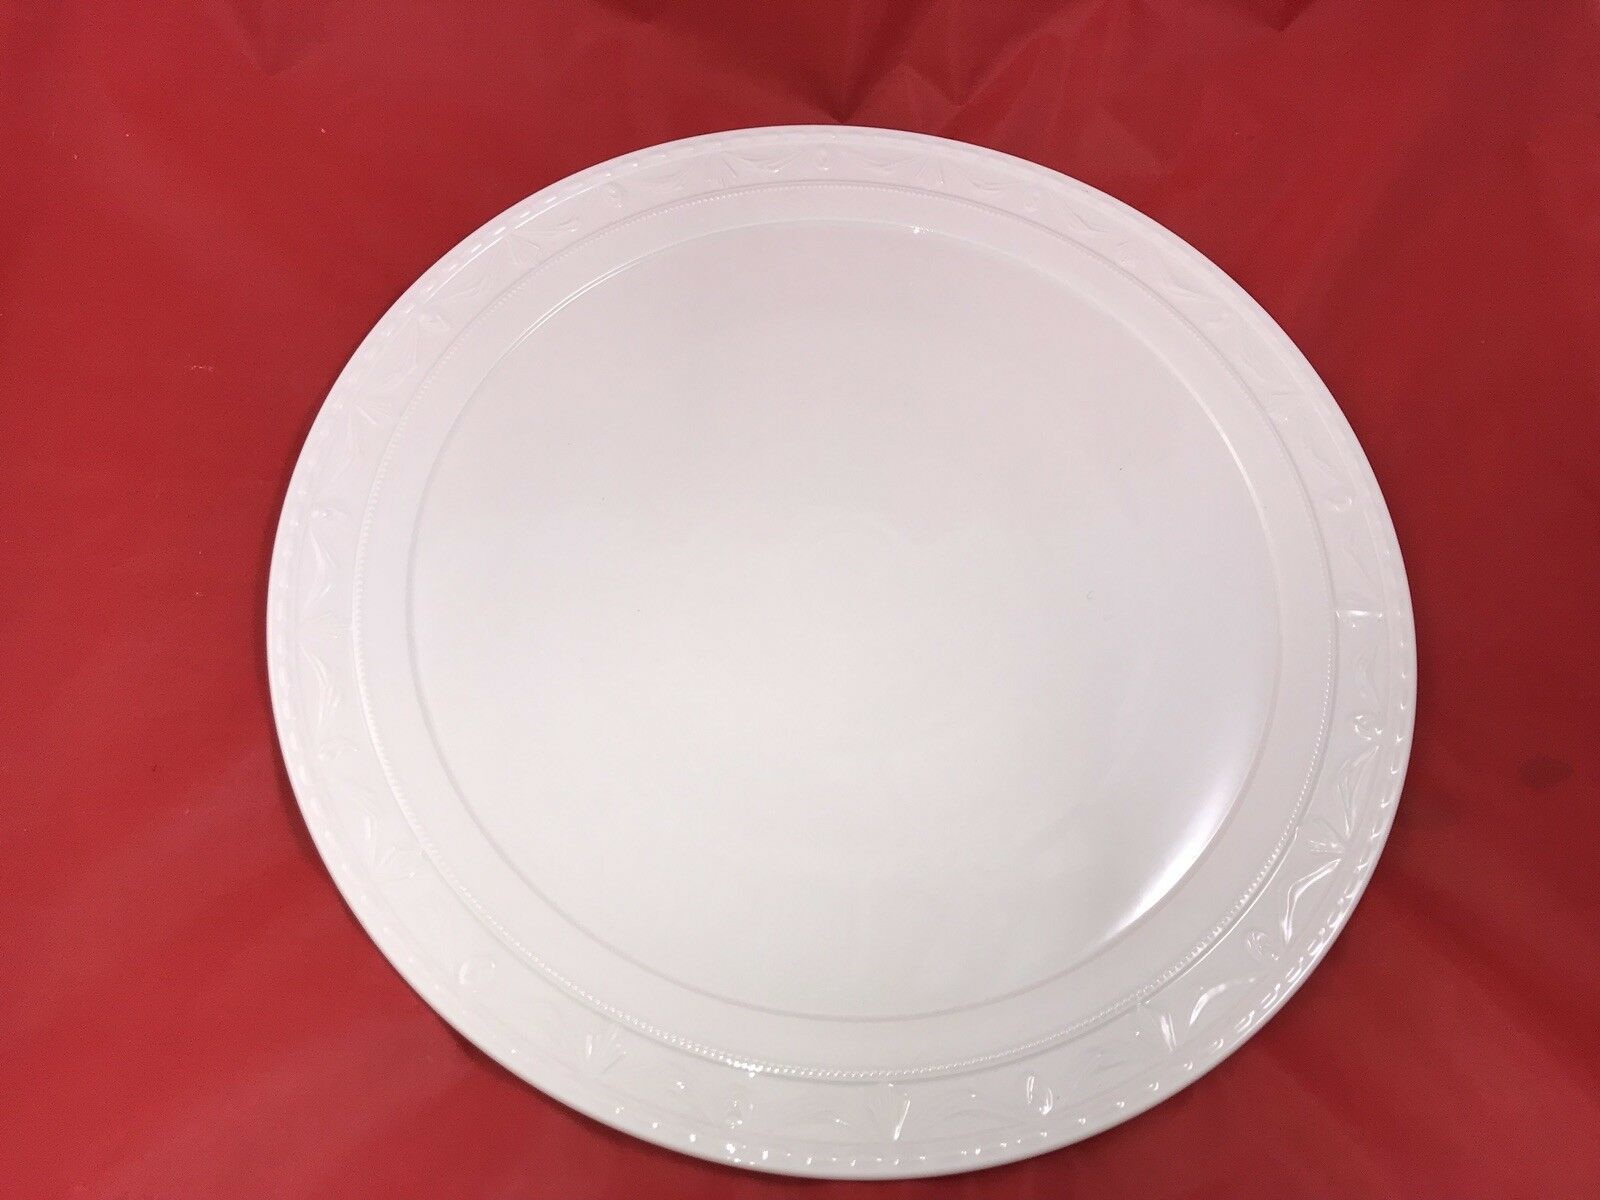 KPM Kurland Berlin Große Platte Teller Rund Weiß 39,5 cm | Merkwürdige Form